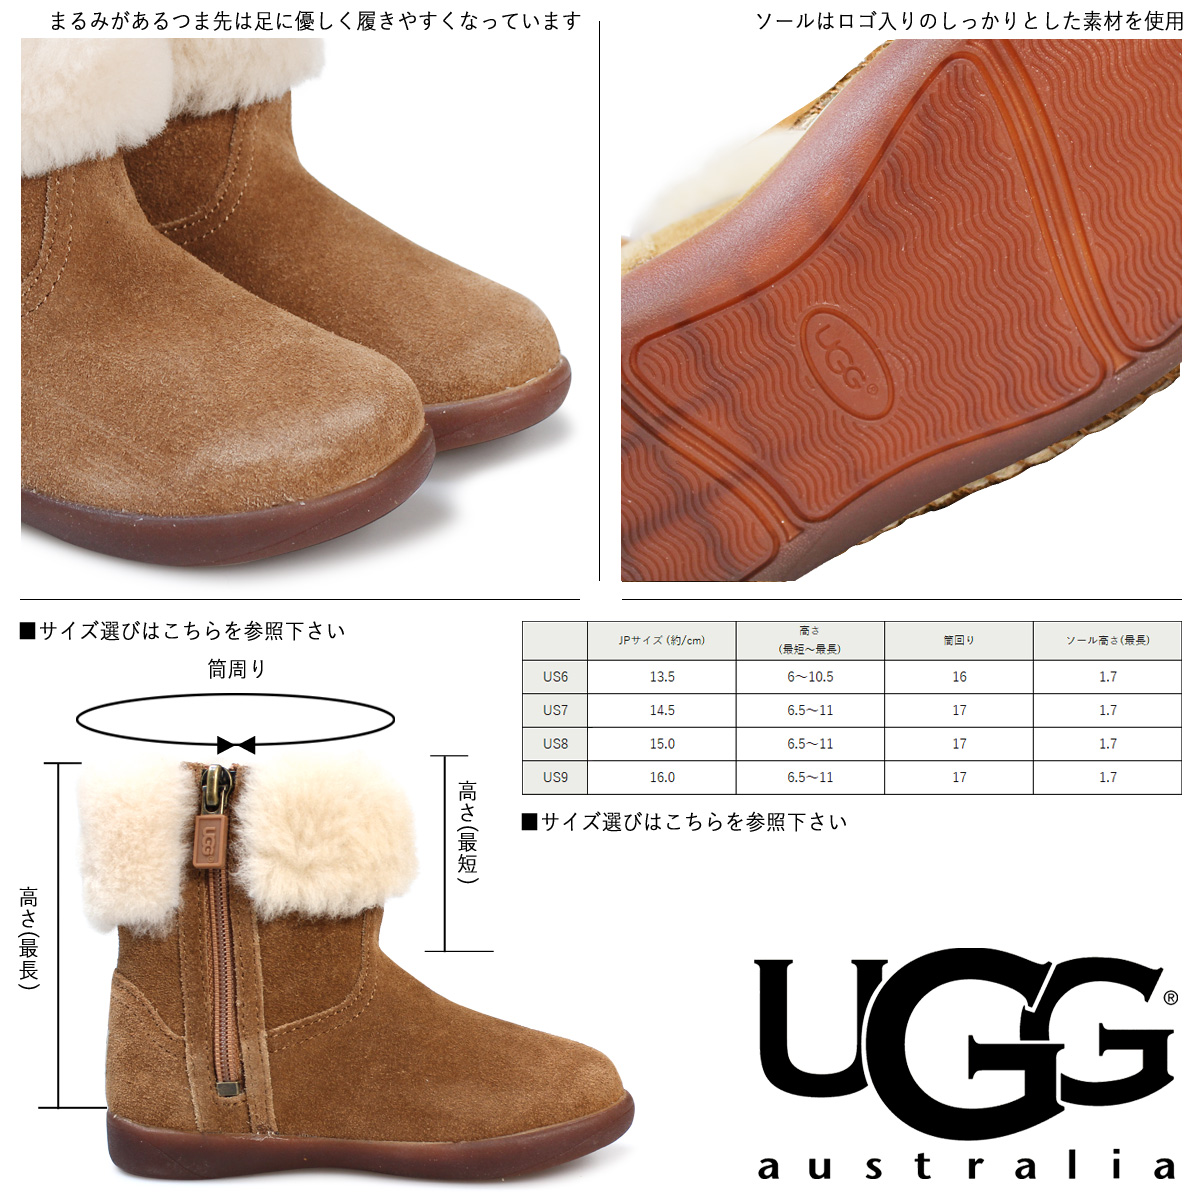 7037b7f00b1 UGG Ugg Classic mini Sheepskin boots kids JORIE II 1003656T Sheepskin  toddler [10/31/new in stock]